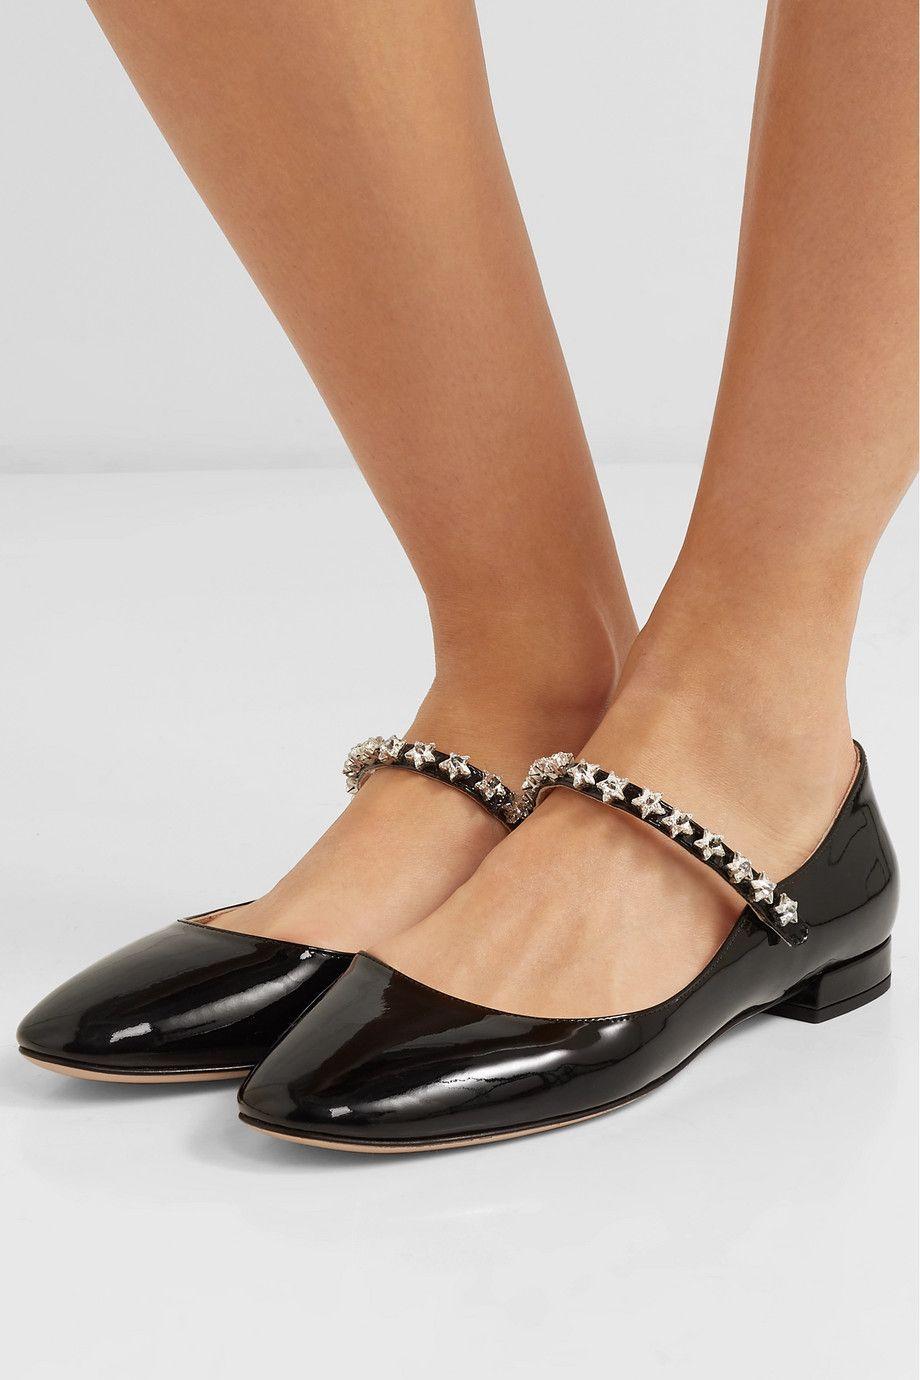 018a0085fed Miu Miu | Crystal-embellished patent-leather Mary Jane ballet flats |  NET-A-PORTER.COM